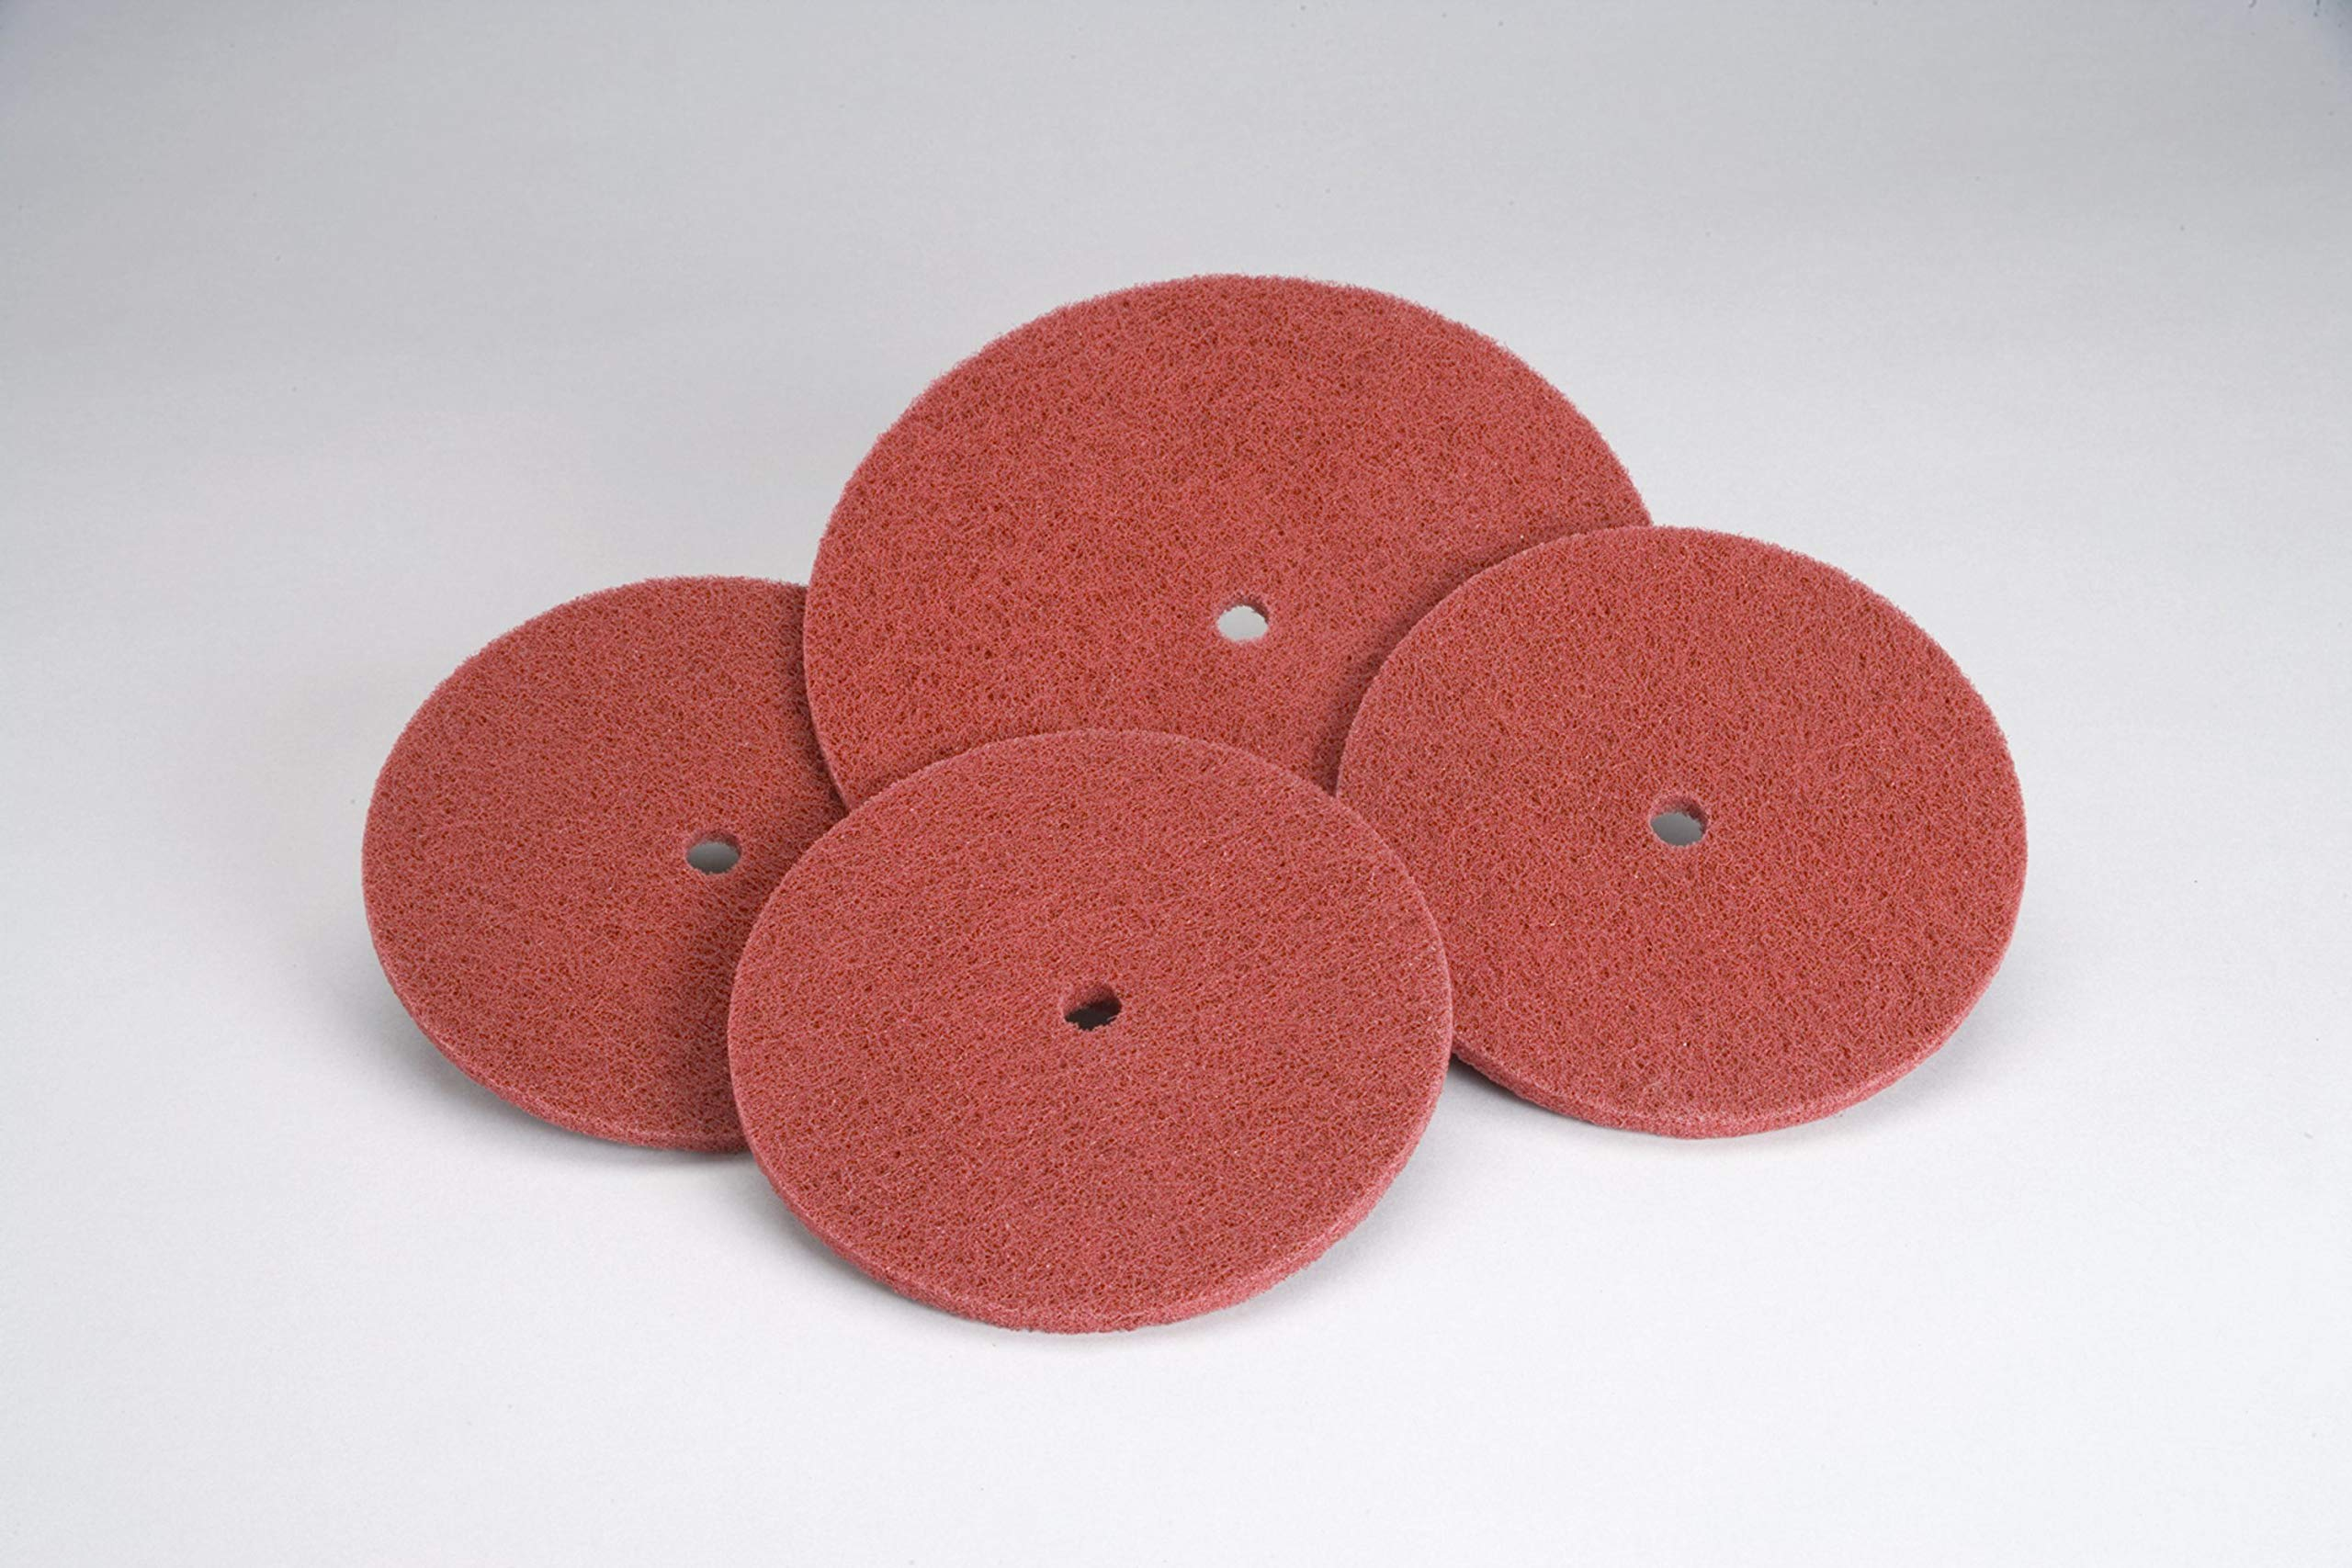 Standard Abrasives Quick Change TSM Buff and Blend HP Disc 850415, 3 in A VFN